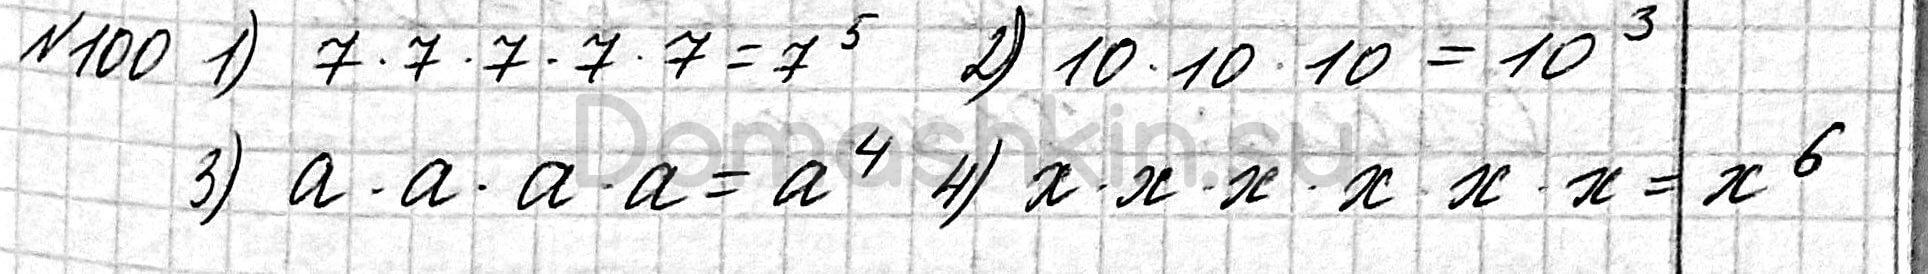 Математика 6 класс учебник Мерзляк номер 100 решение